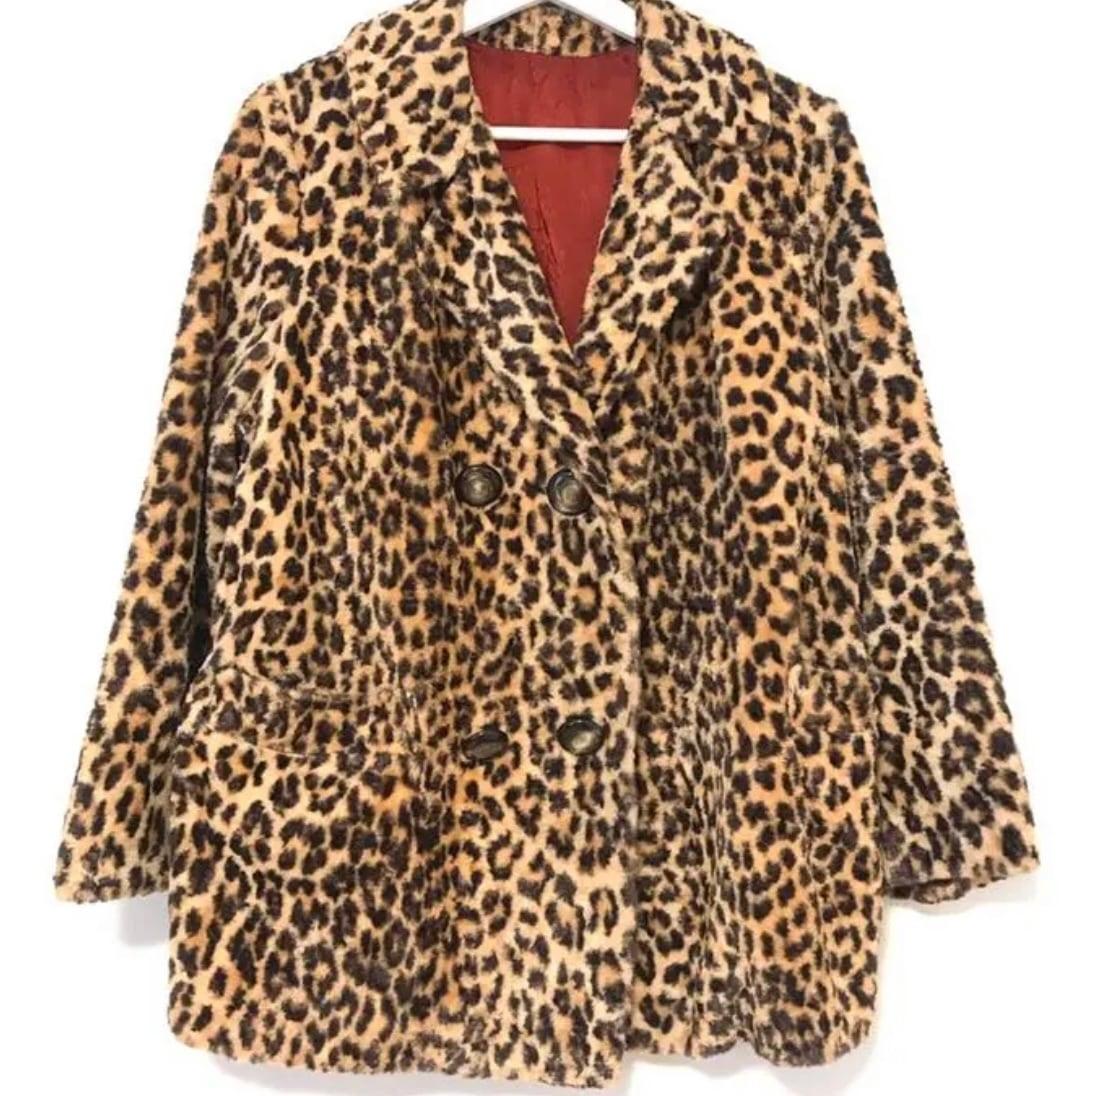 K様専用 70's Fake Fur Leopard Jacket